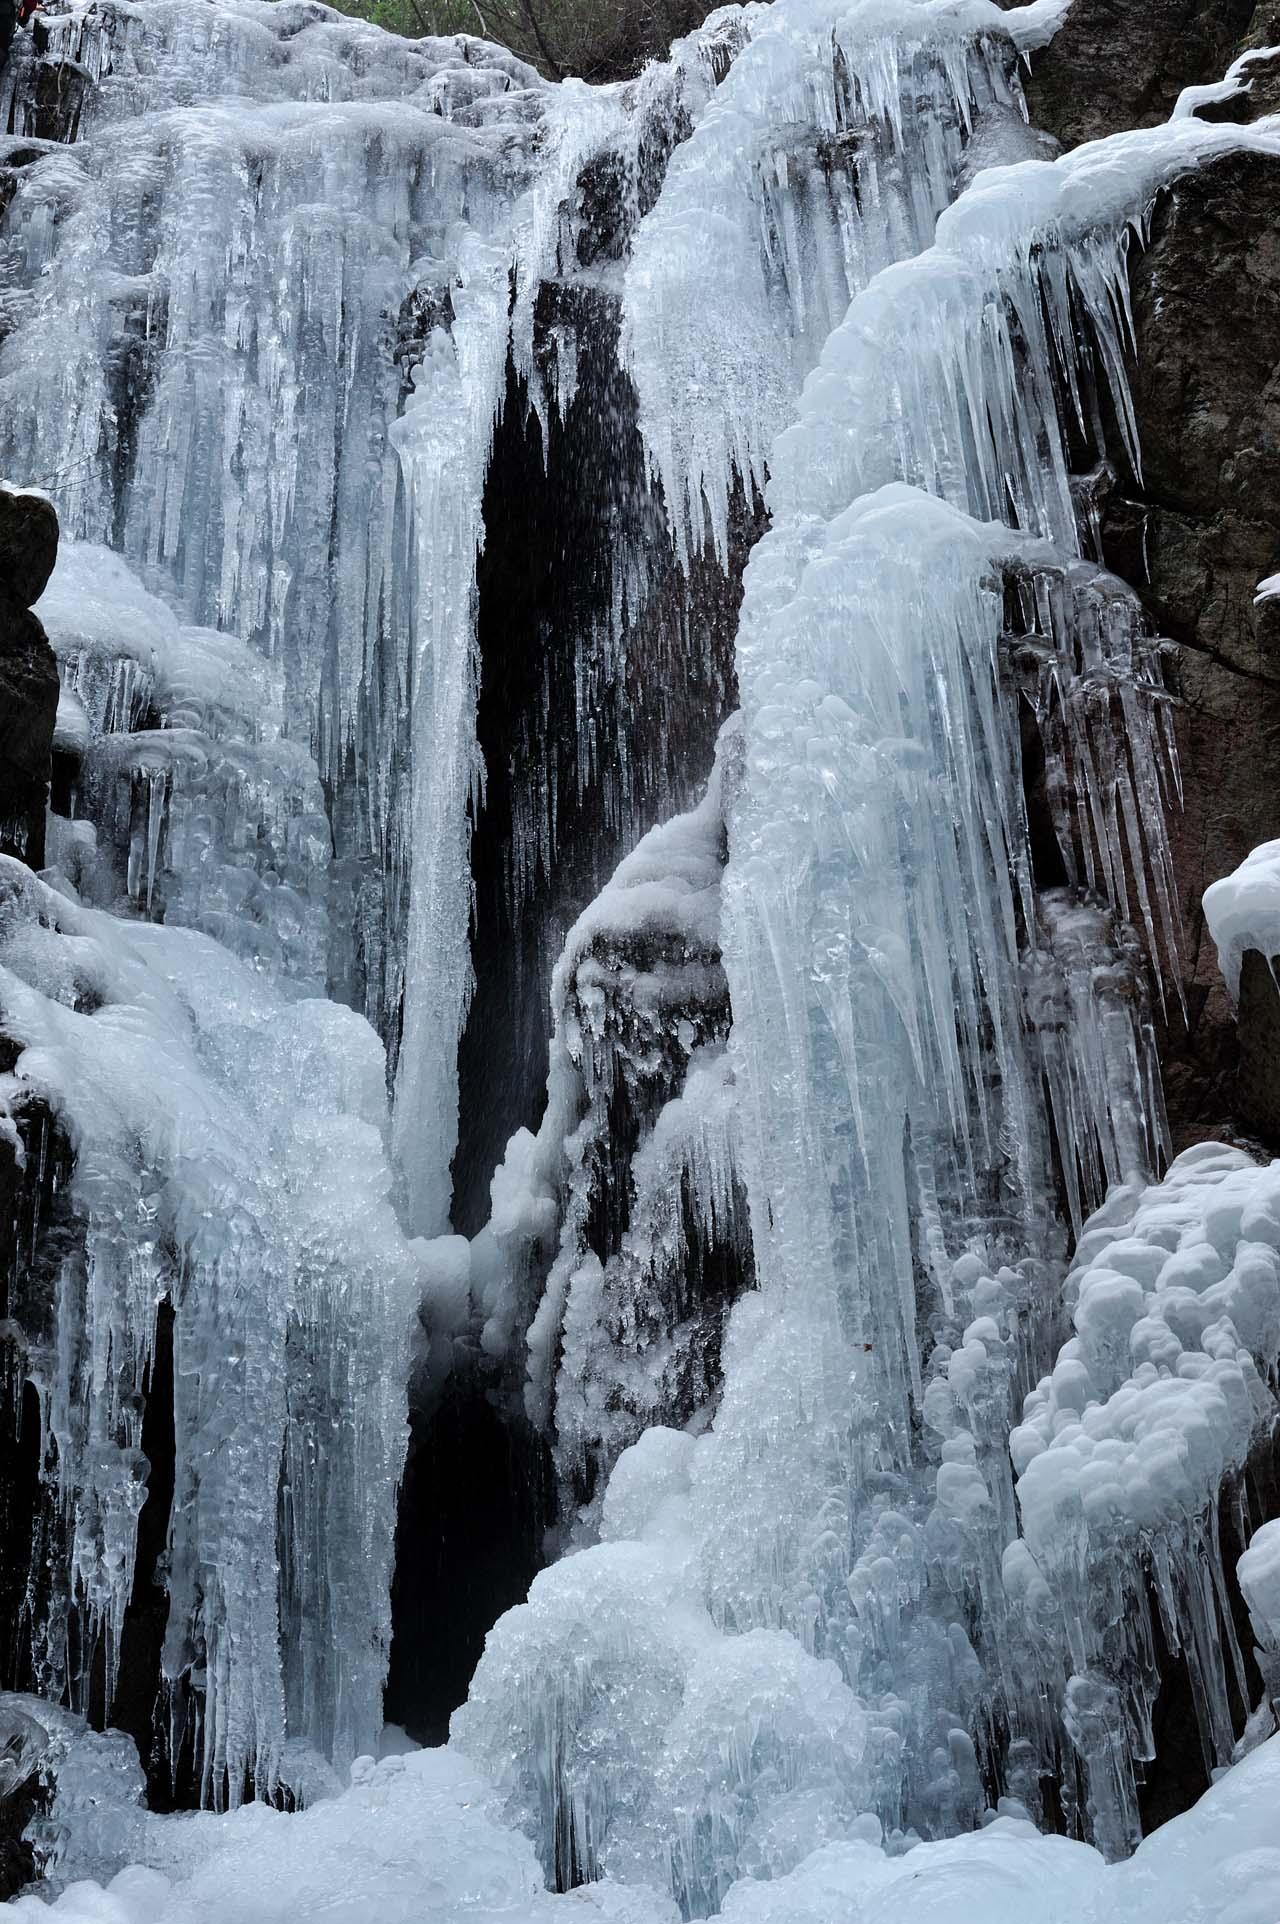 七曲滝の氷結_c0129047_23135598.jpg